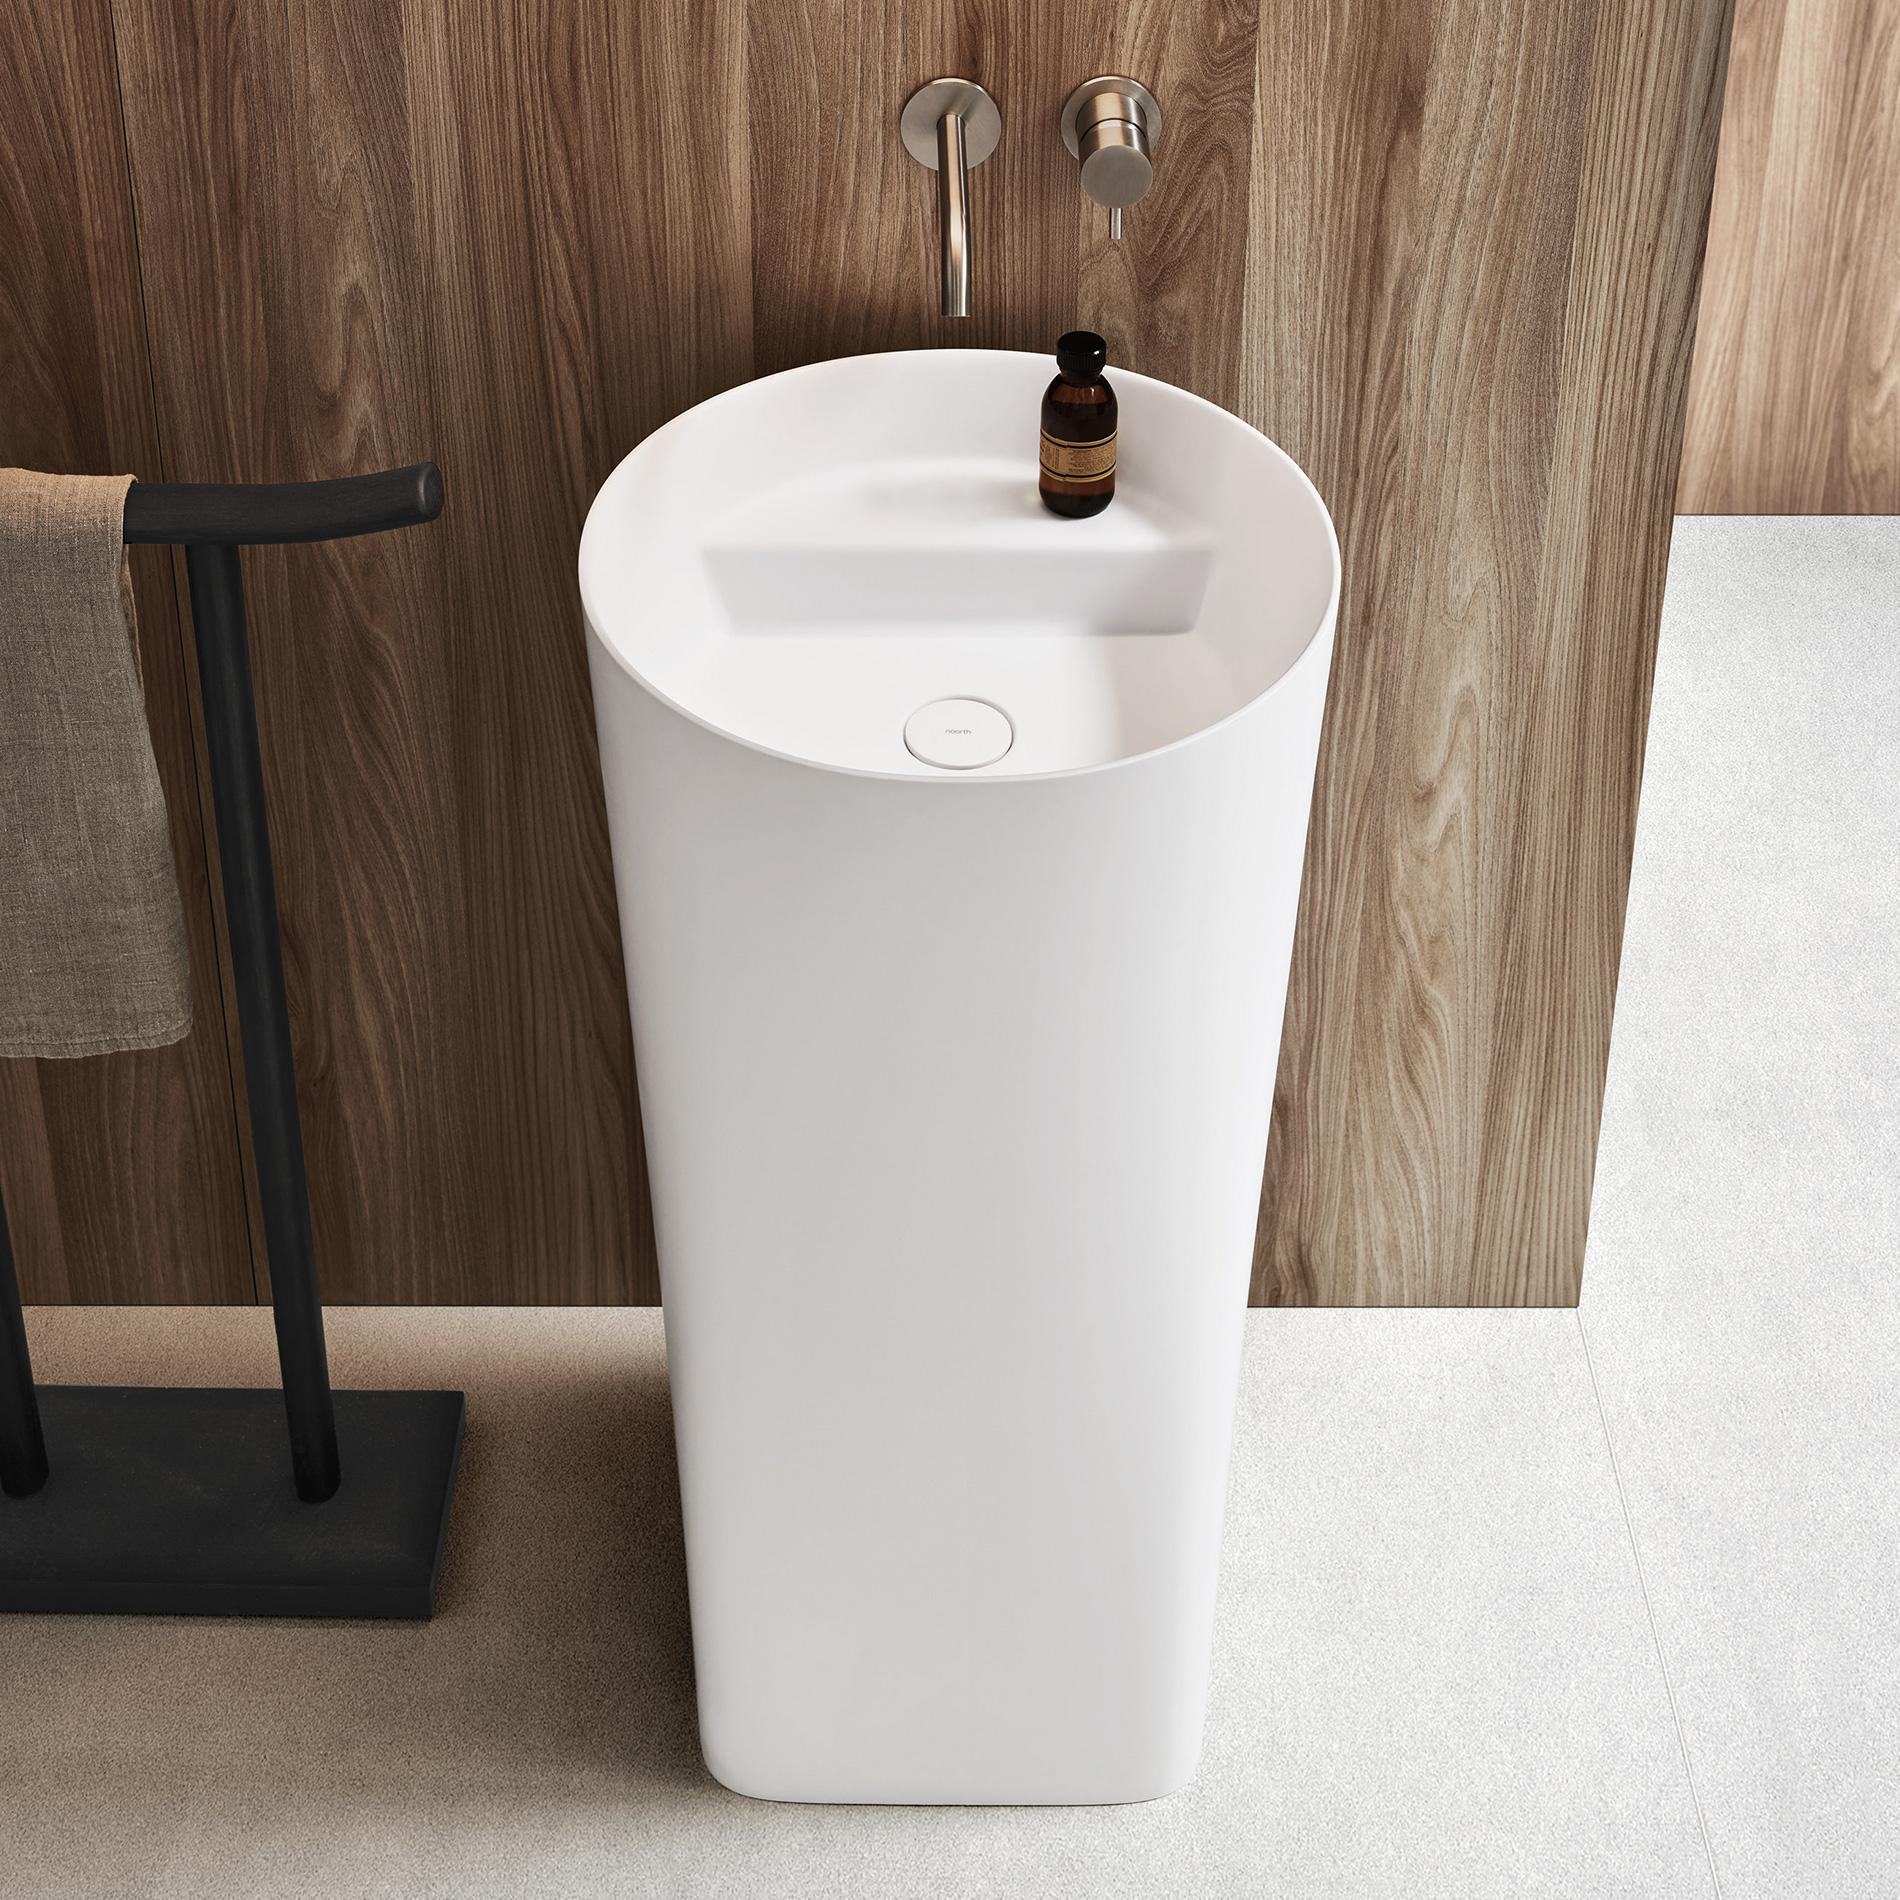 Nicos-International-home-products-Milldue-washbasins-1